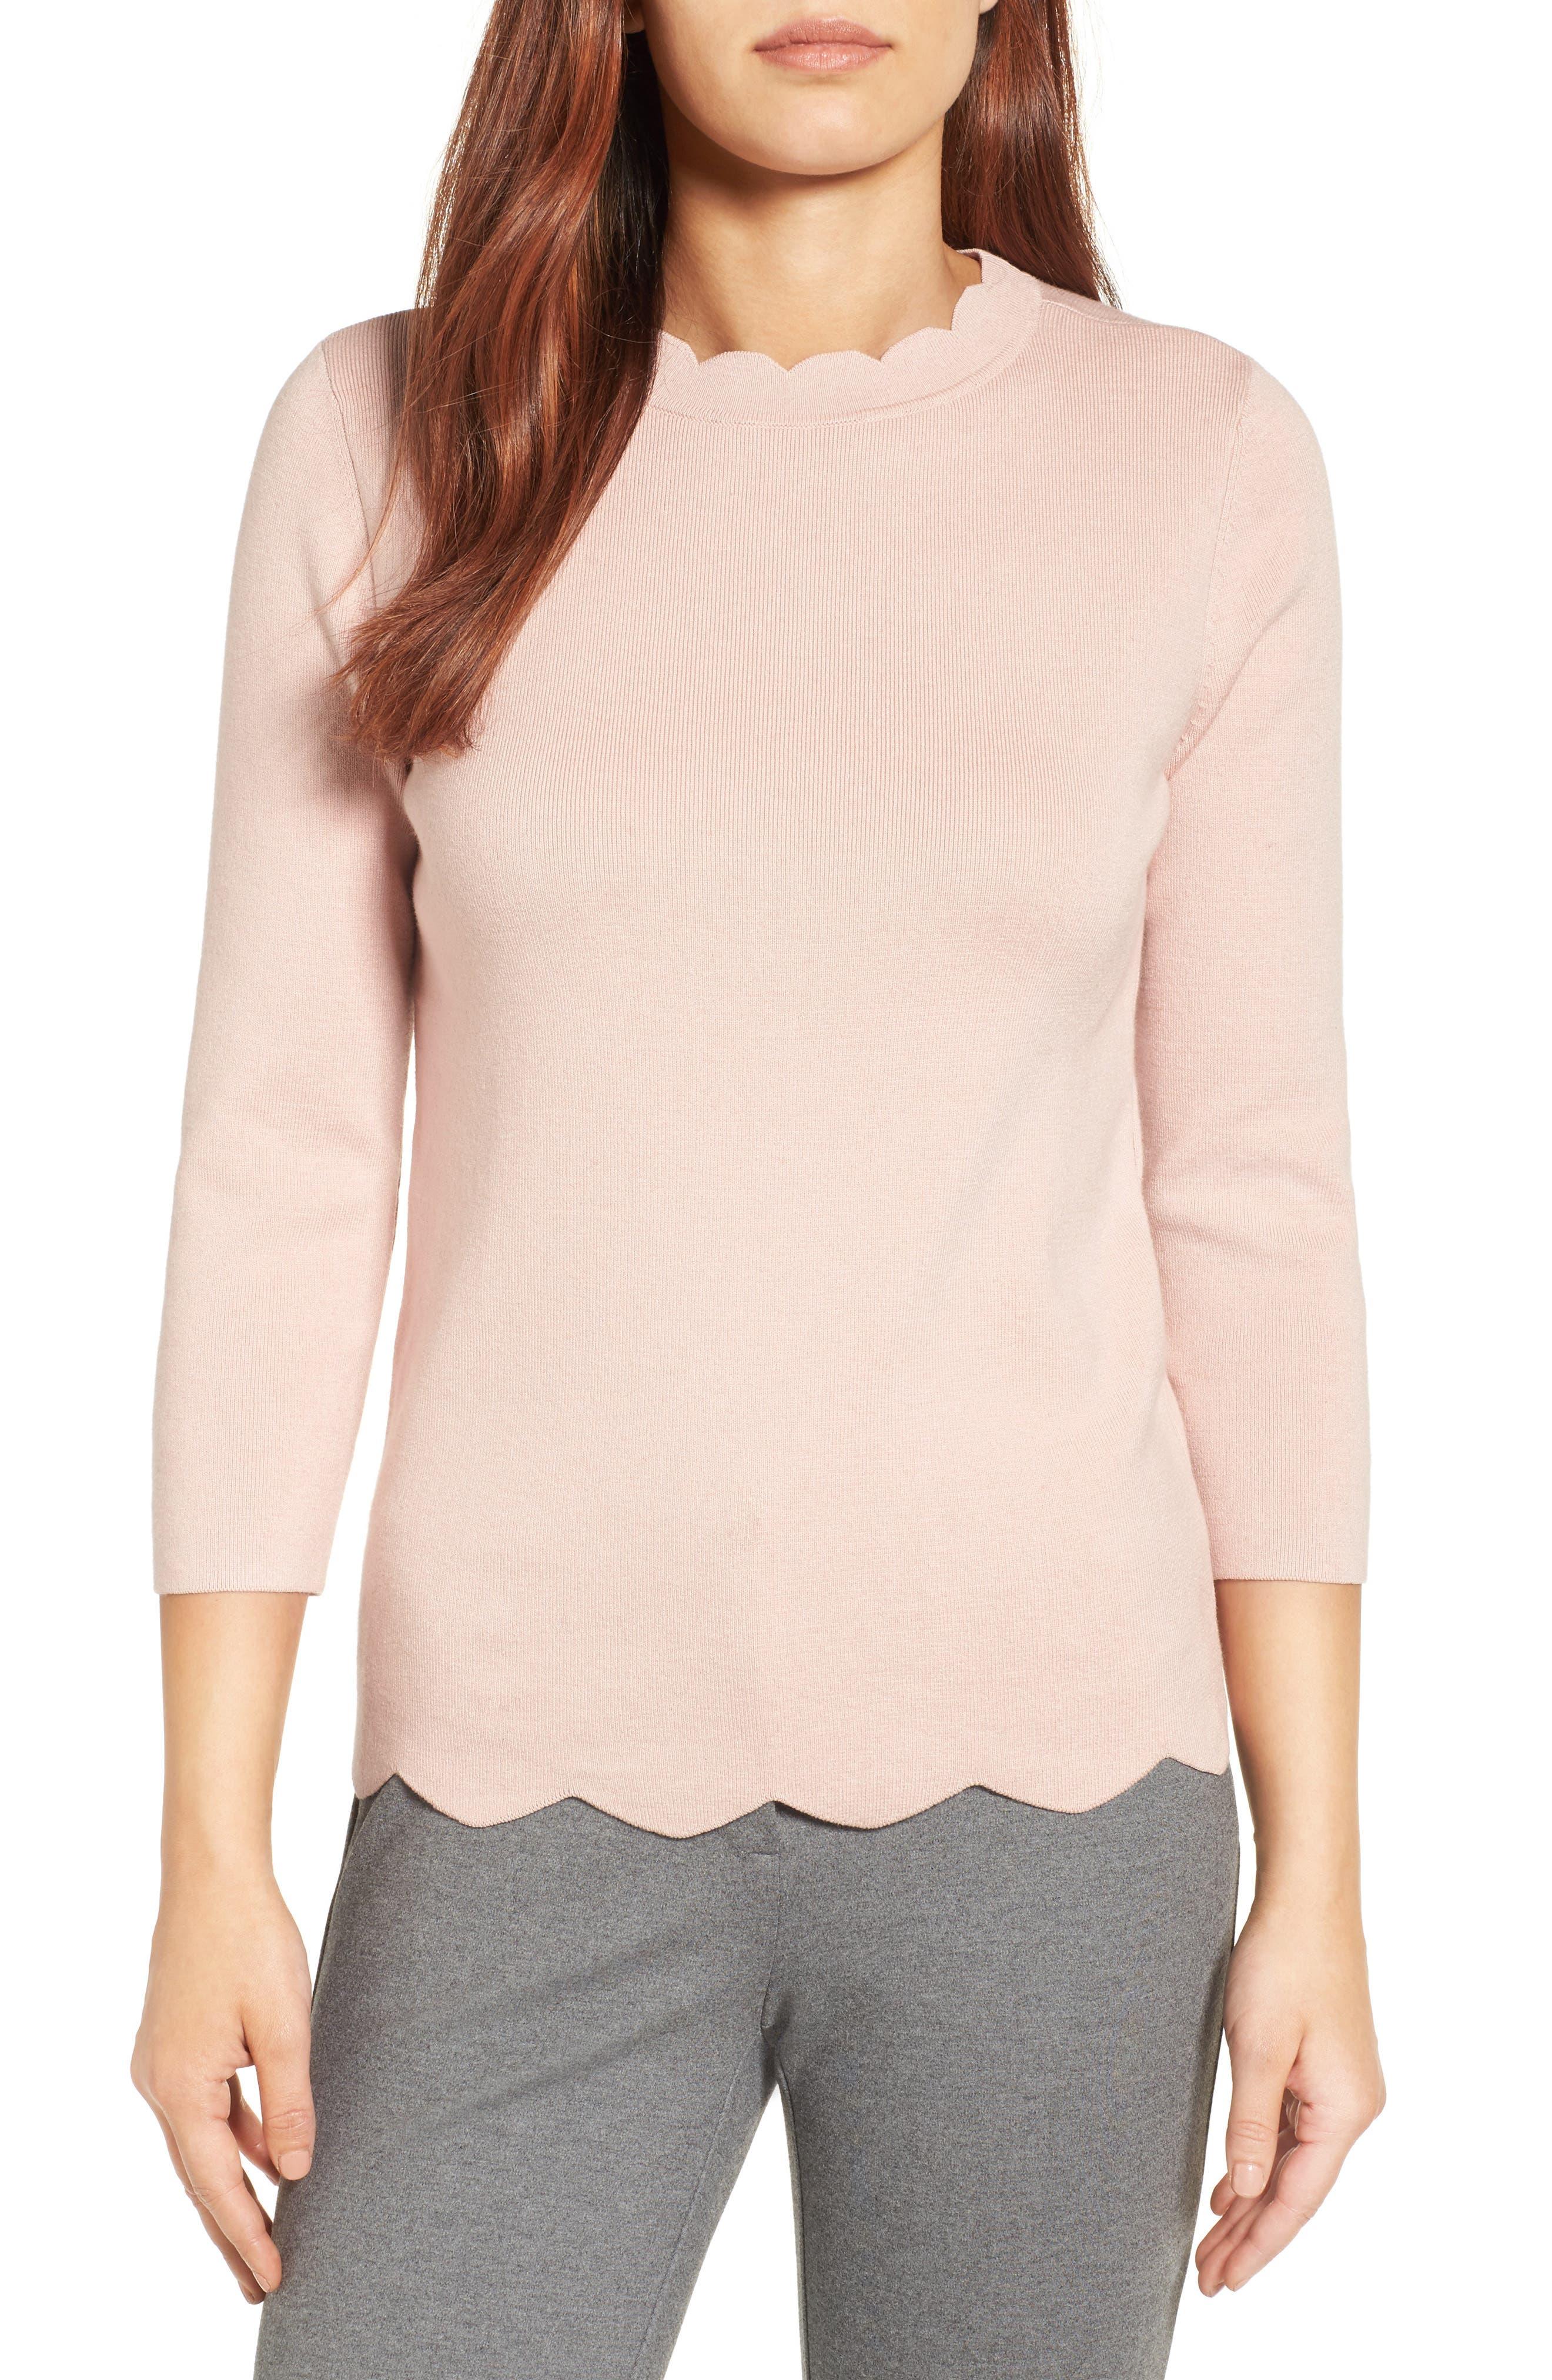 Alternate Image 1 Selected - Halogen Scallop Edge Sweater (Regular & Petite)